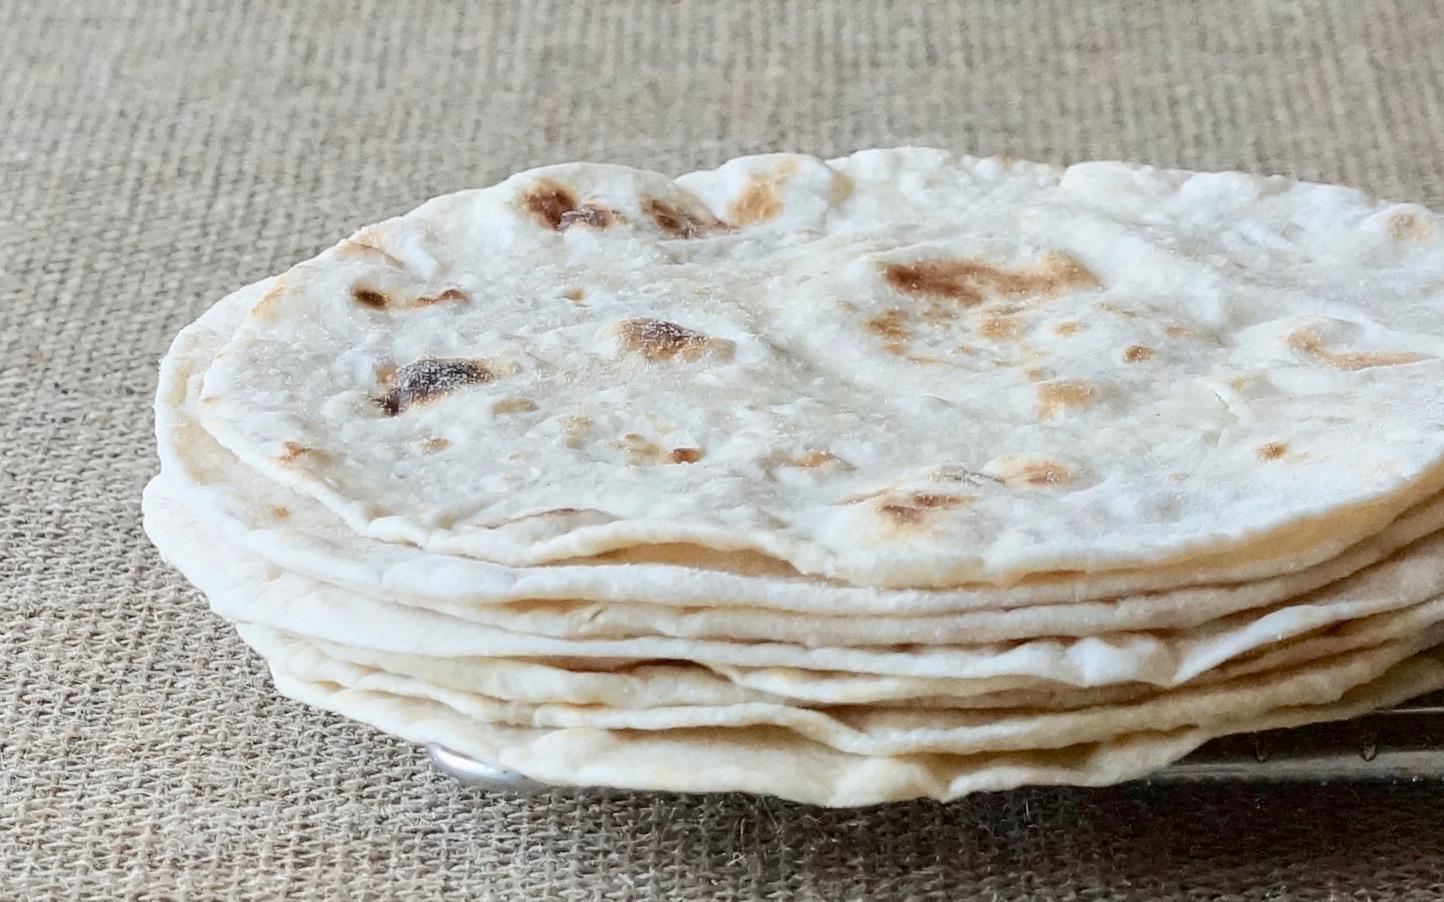 Homemade-Flour-Tortillas-Rebecca-Gordon-Editor-In-Chief-Buttermilk-Lipstick-Culinary-Entertaining-Techniques-RebeccaGordon-Southern-Hostess-Pastry-Chef-Birmingham-Alabama